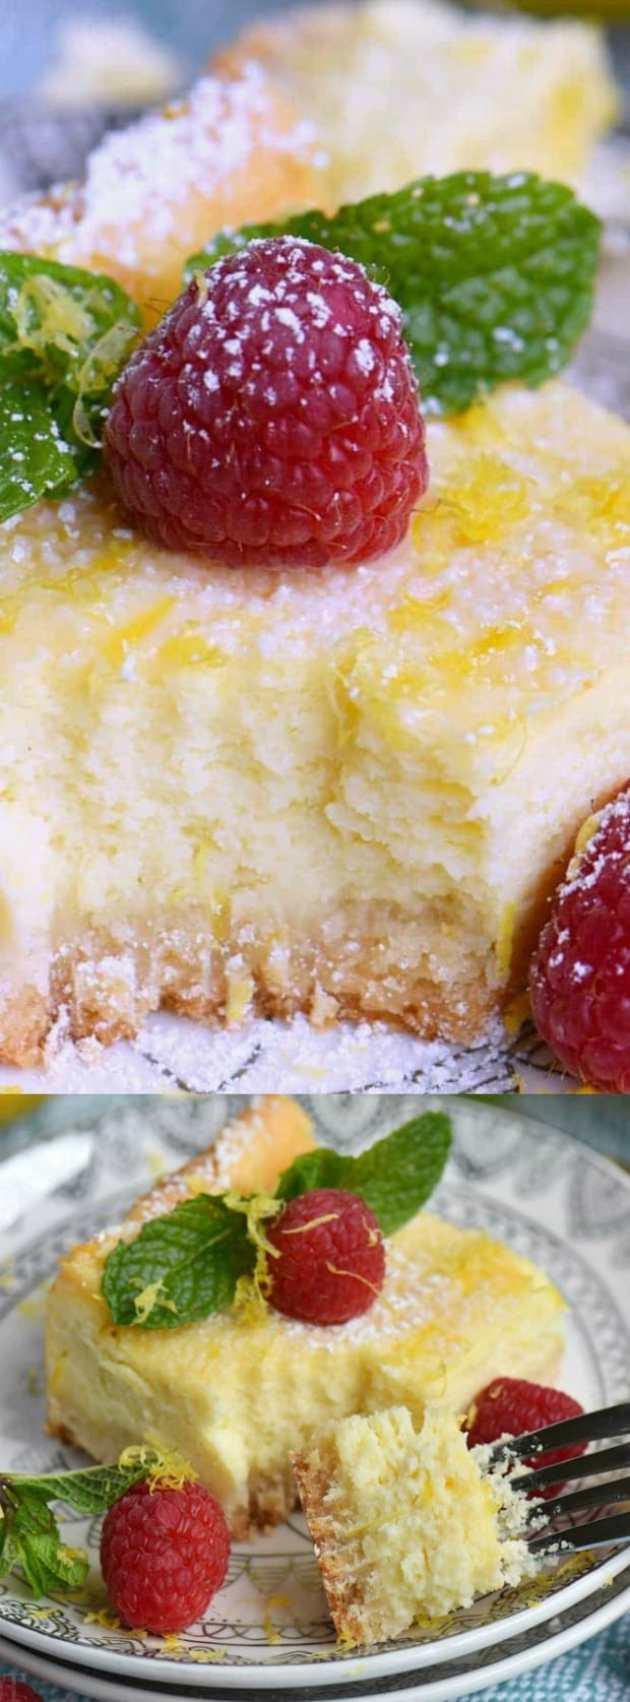 Lemon Cheesecake Bars Longpin